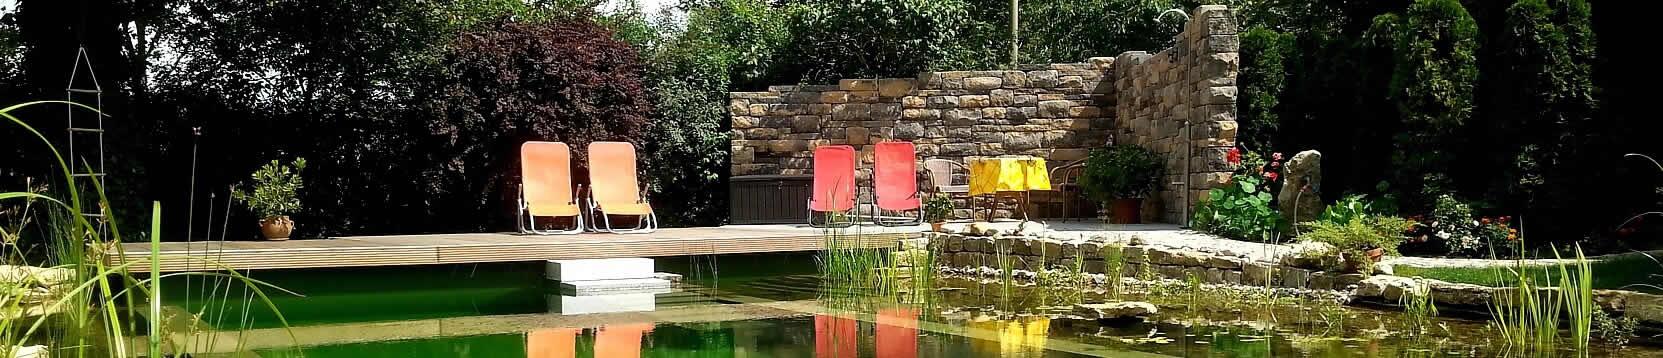 galabau kromsdorf garten u landschaftsbau gmbh. Black Bedroom Furniture Sets. Home Design Ideas